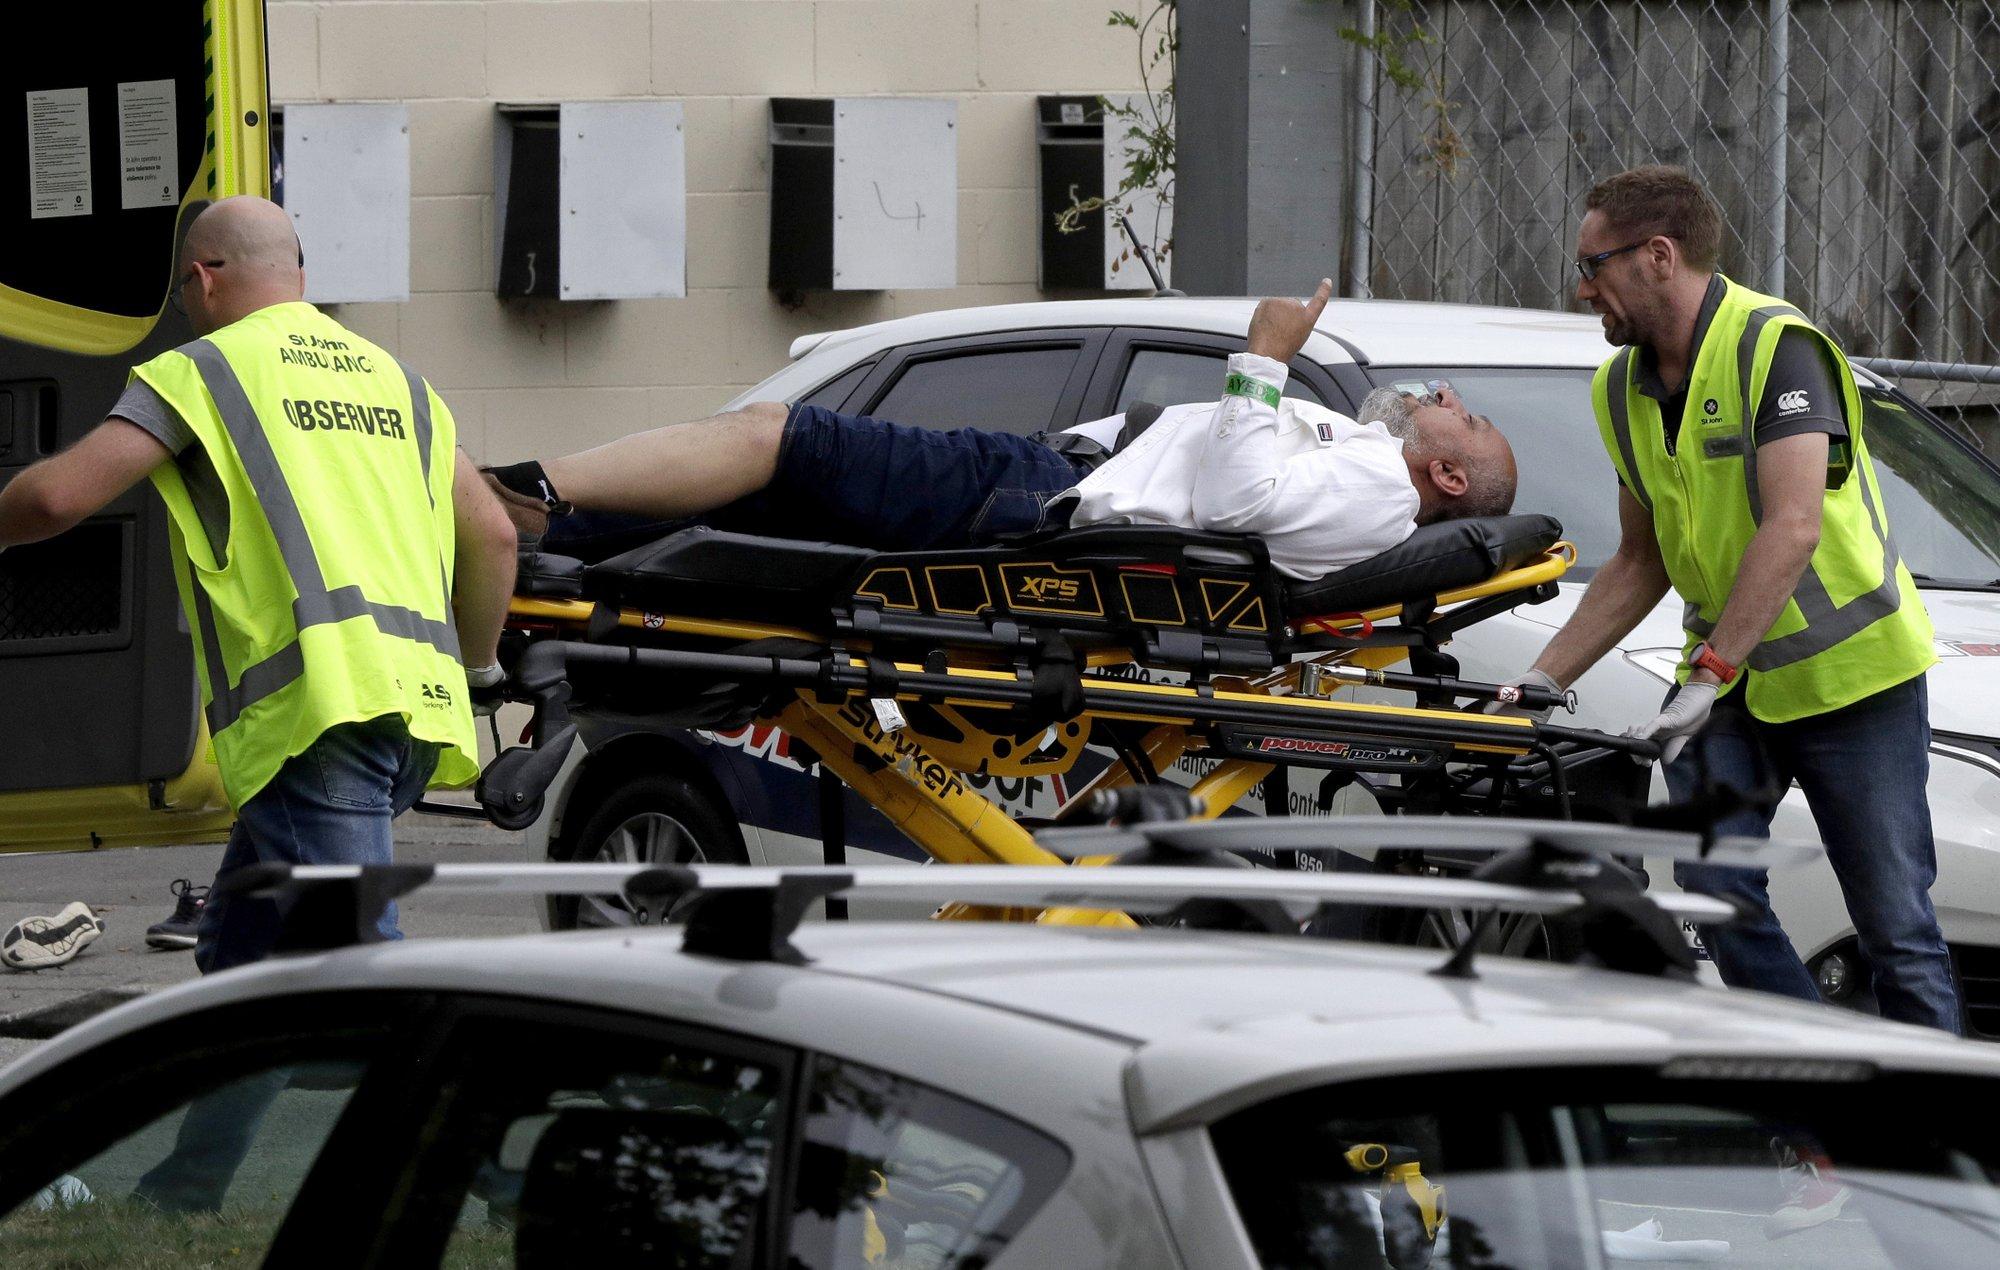 New Zeland Mosque Attack